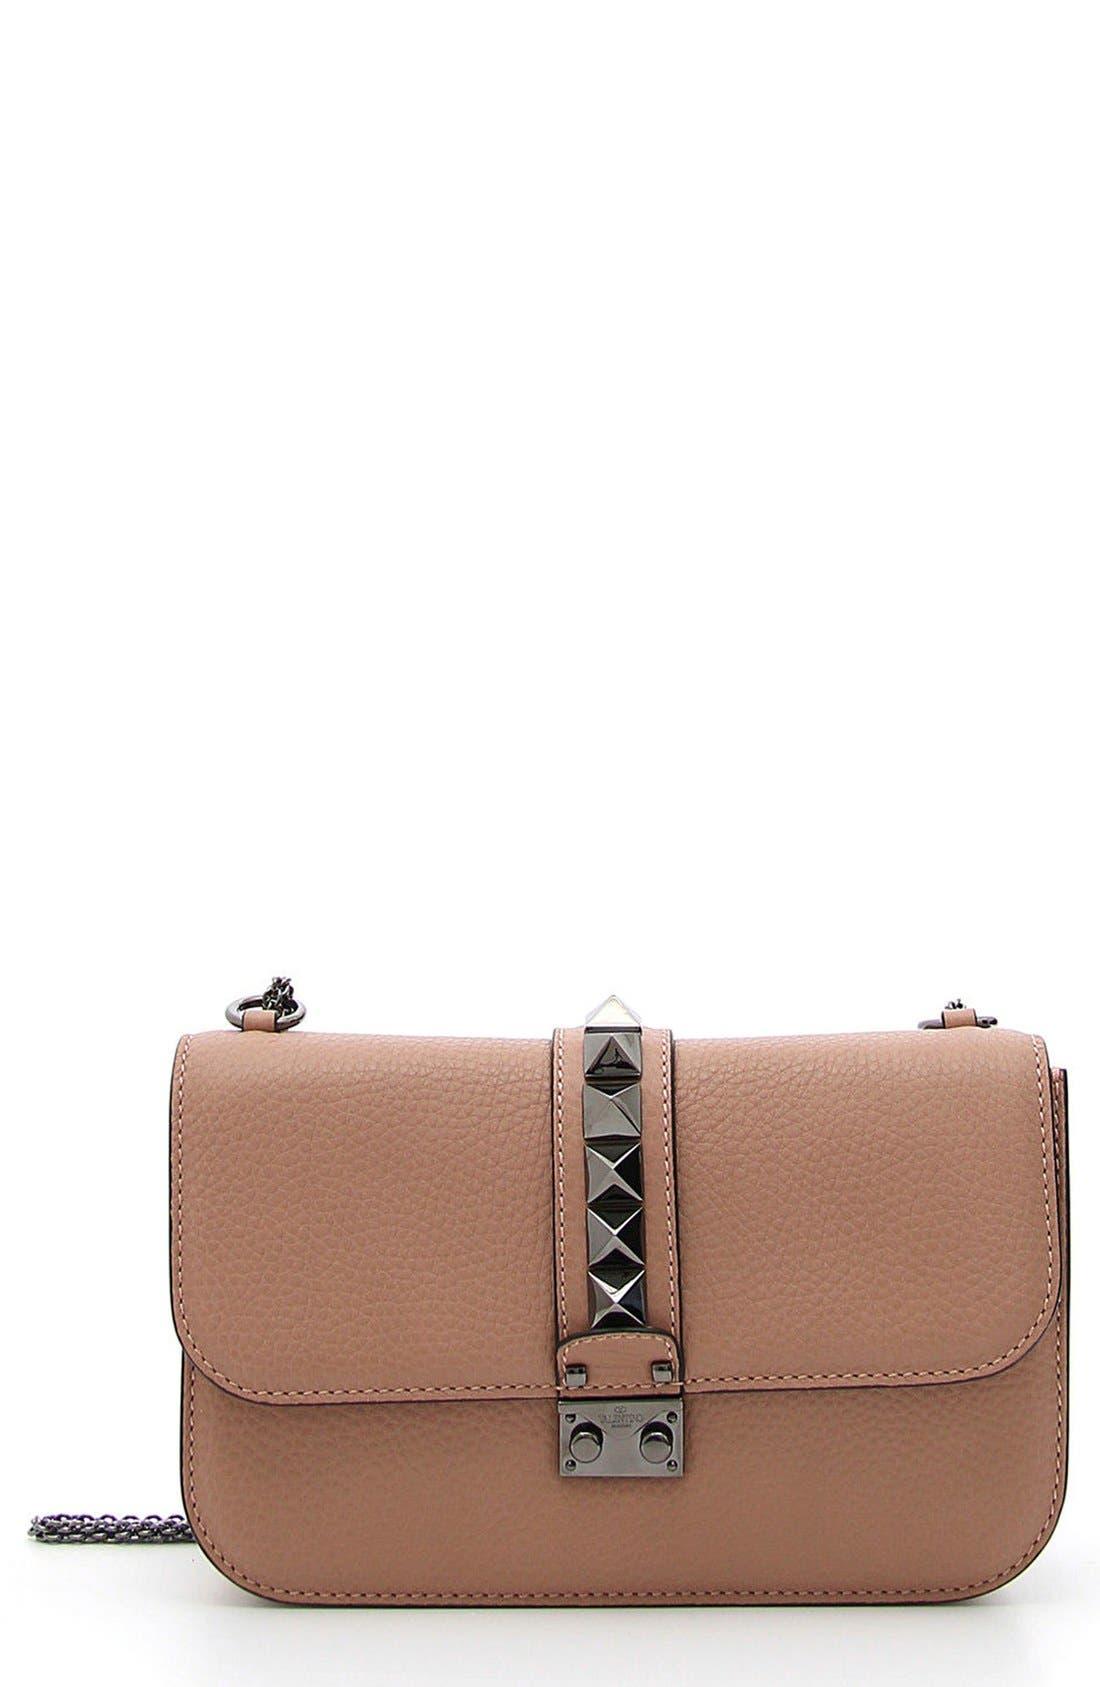 Valentino 'Rockstud - Medium Lock' Leather Shoulder Bag